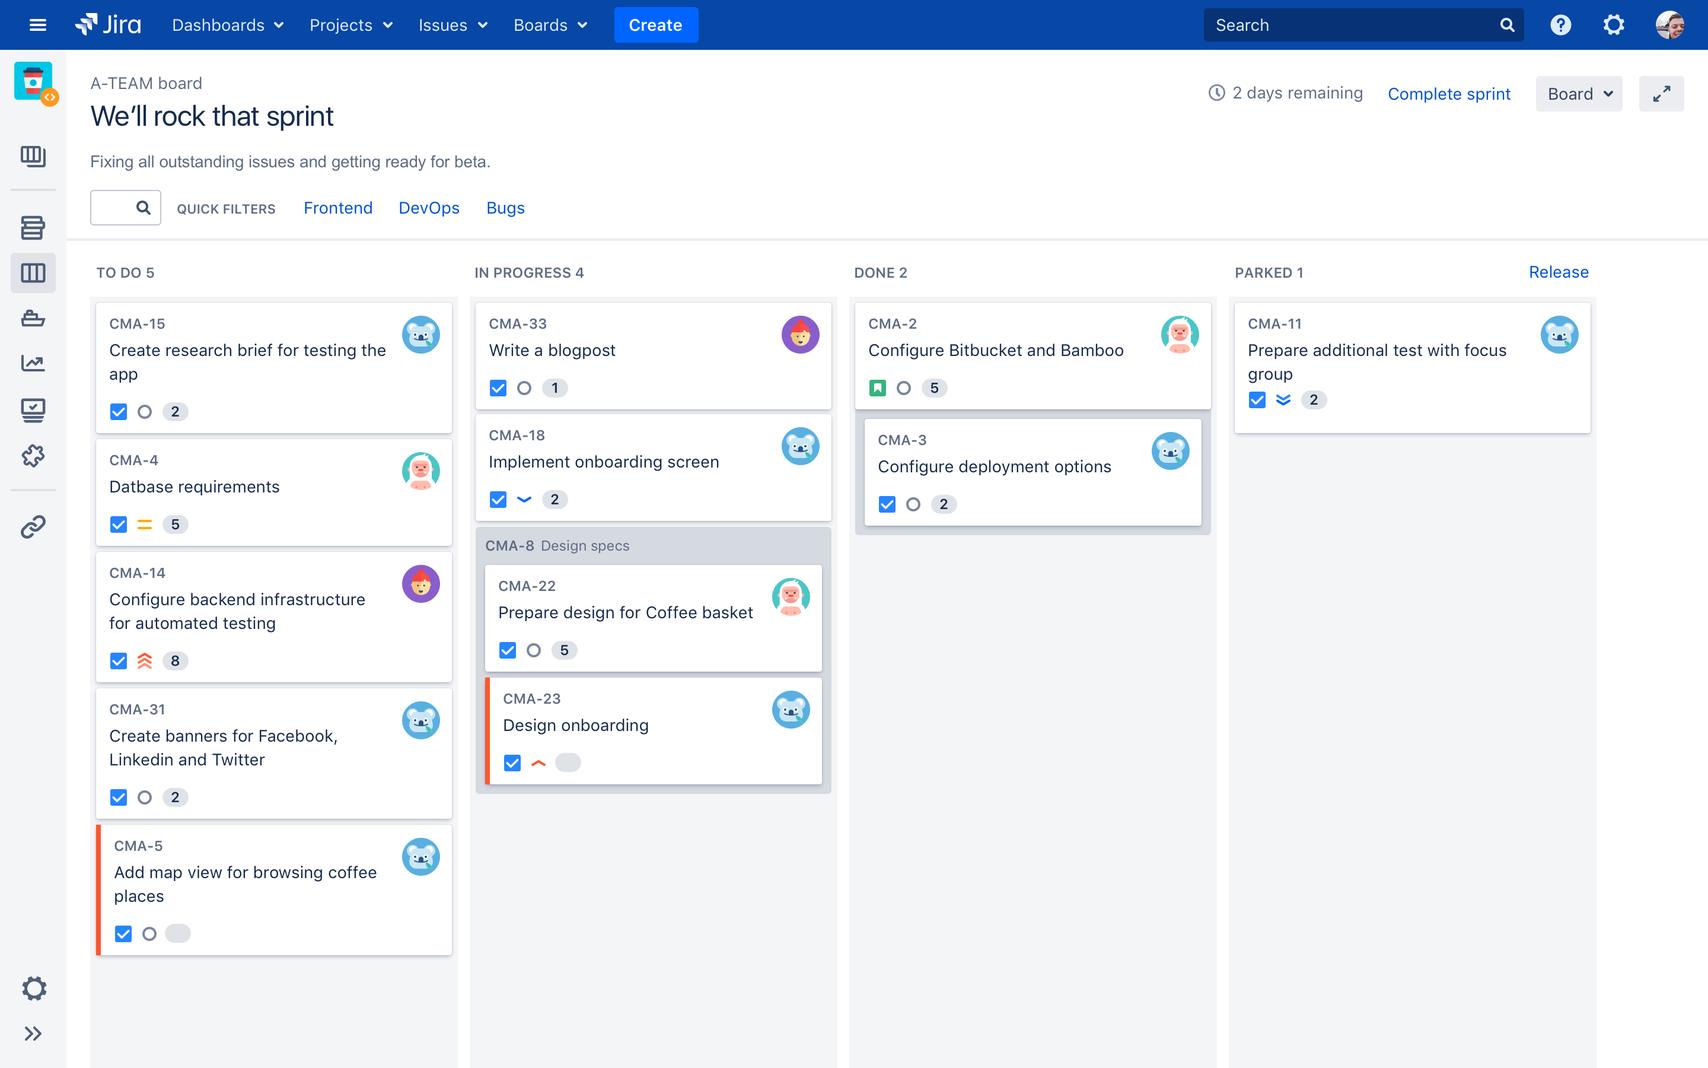 Working with Atlassian JIRA 8.1 full license